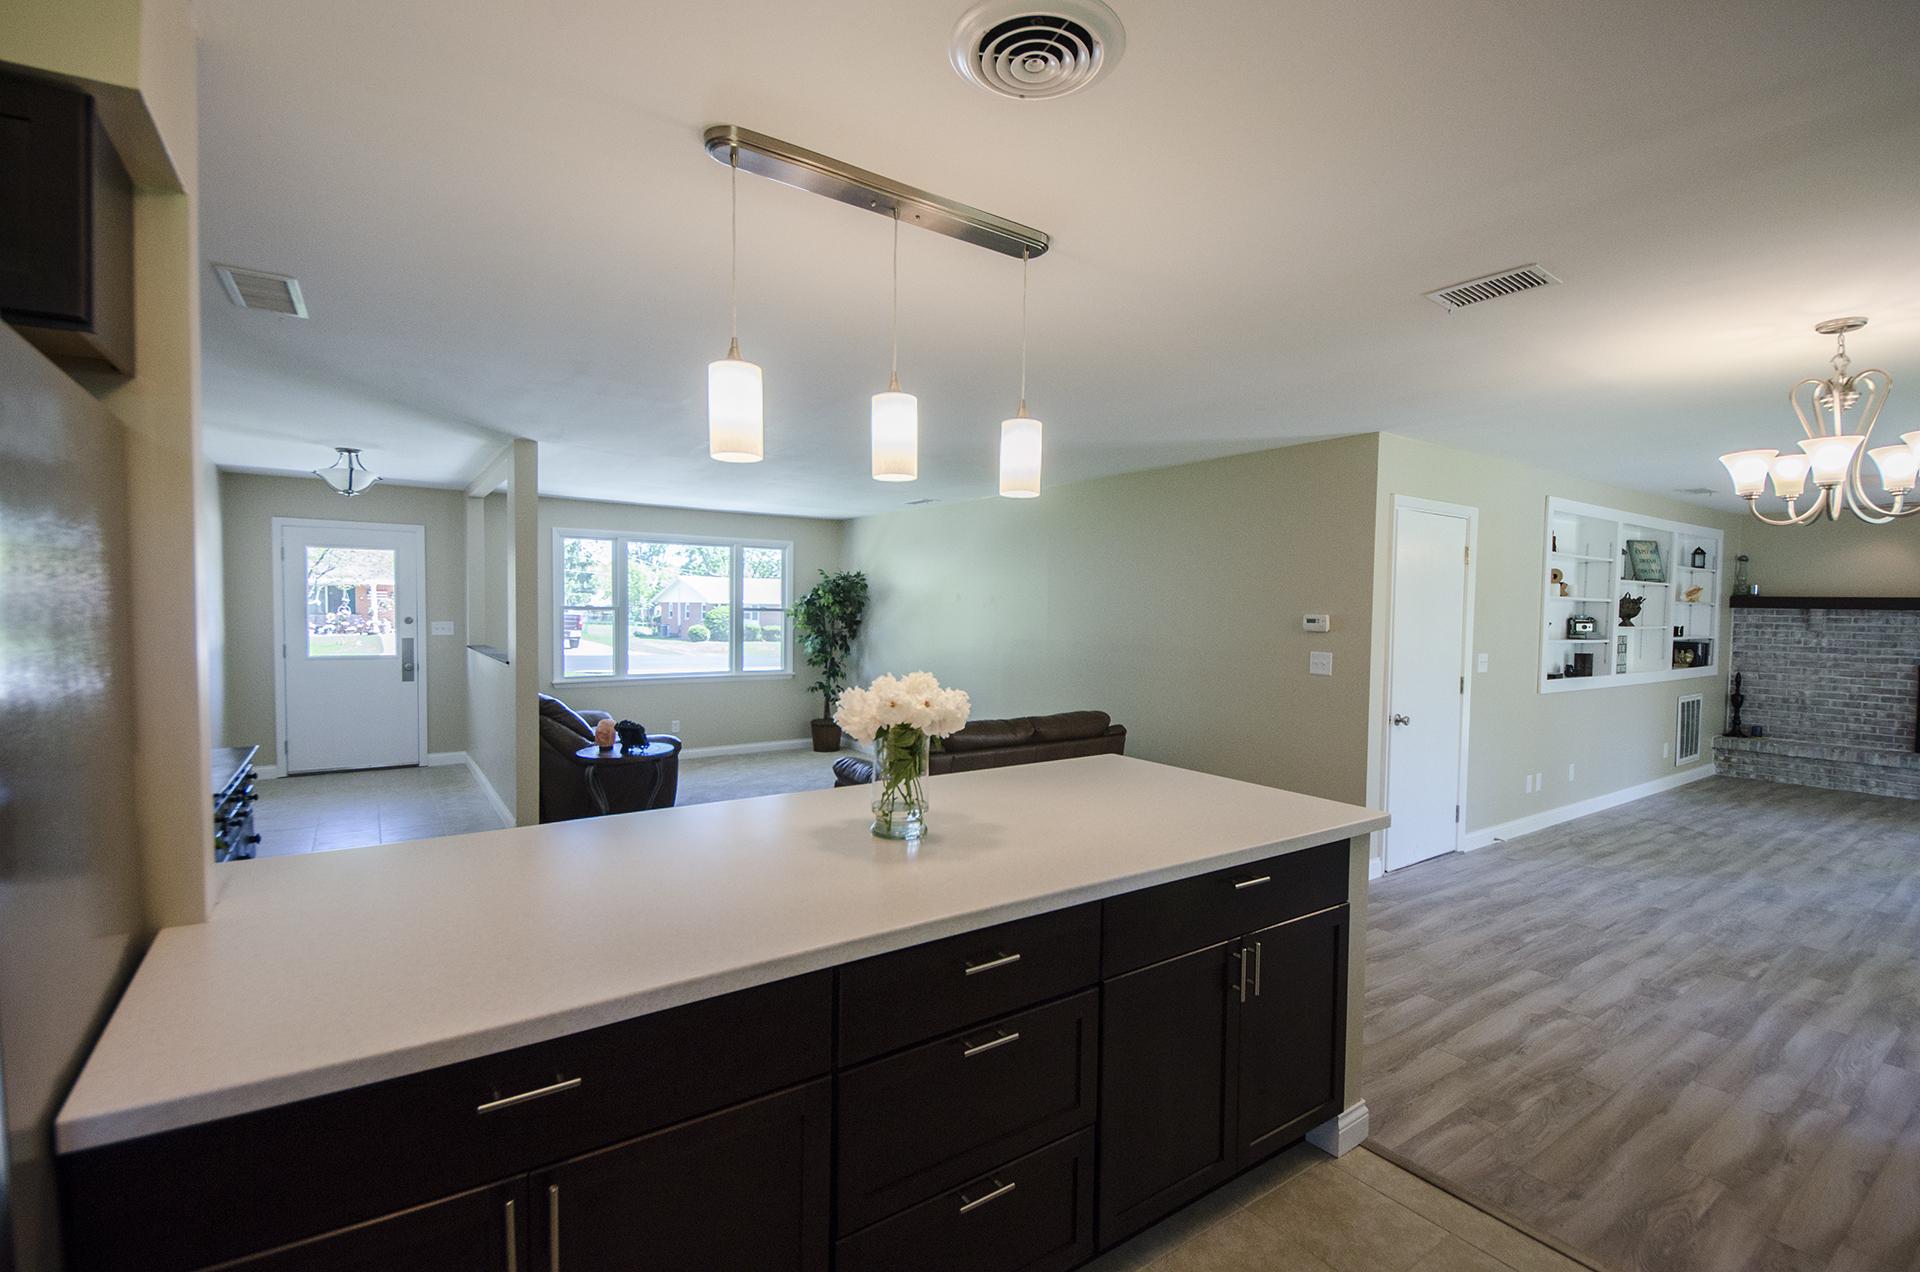 2205 Pine Knott Drive | Beavercreek, OH - Design Homes